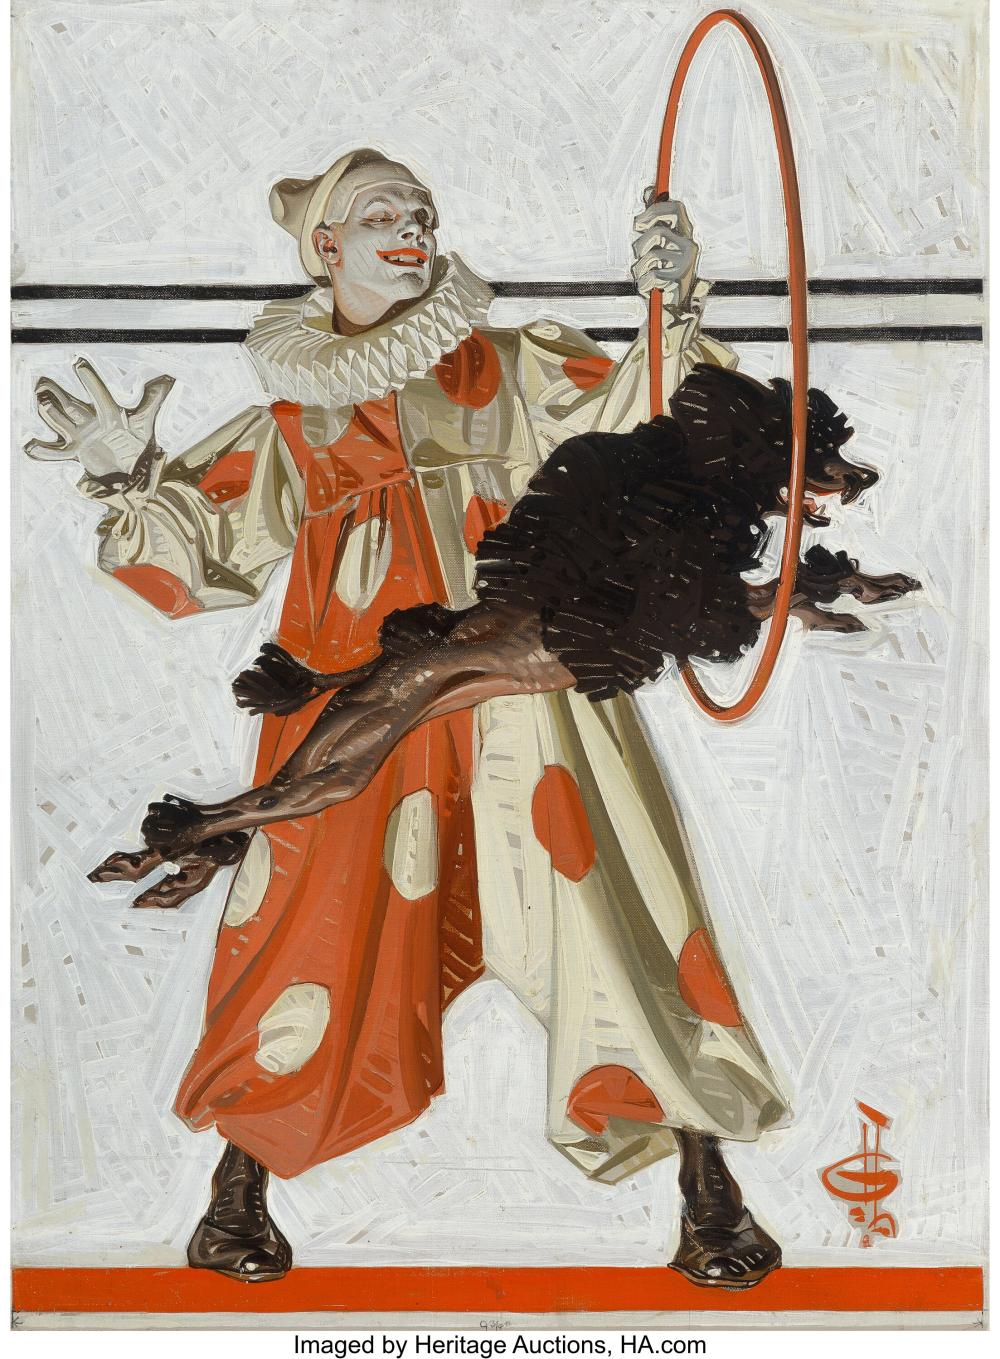 Joseph Christian Leyendecker (American, 1874-1951) Circus Dog, The Saturday Even